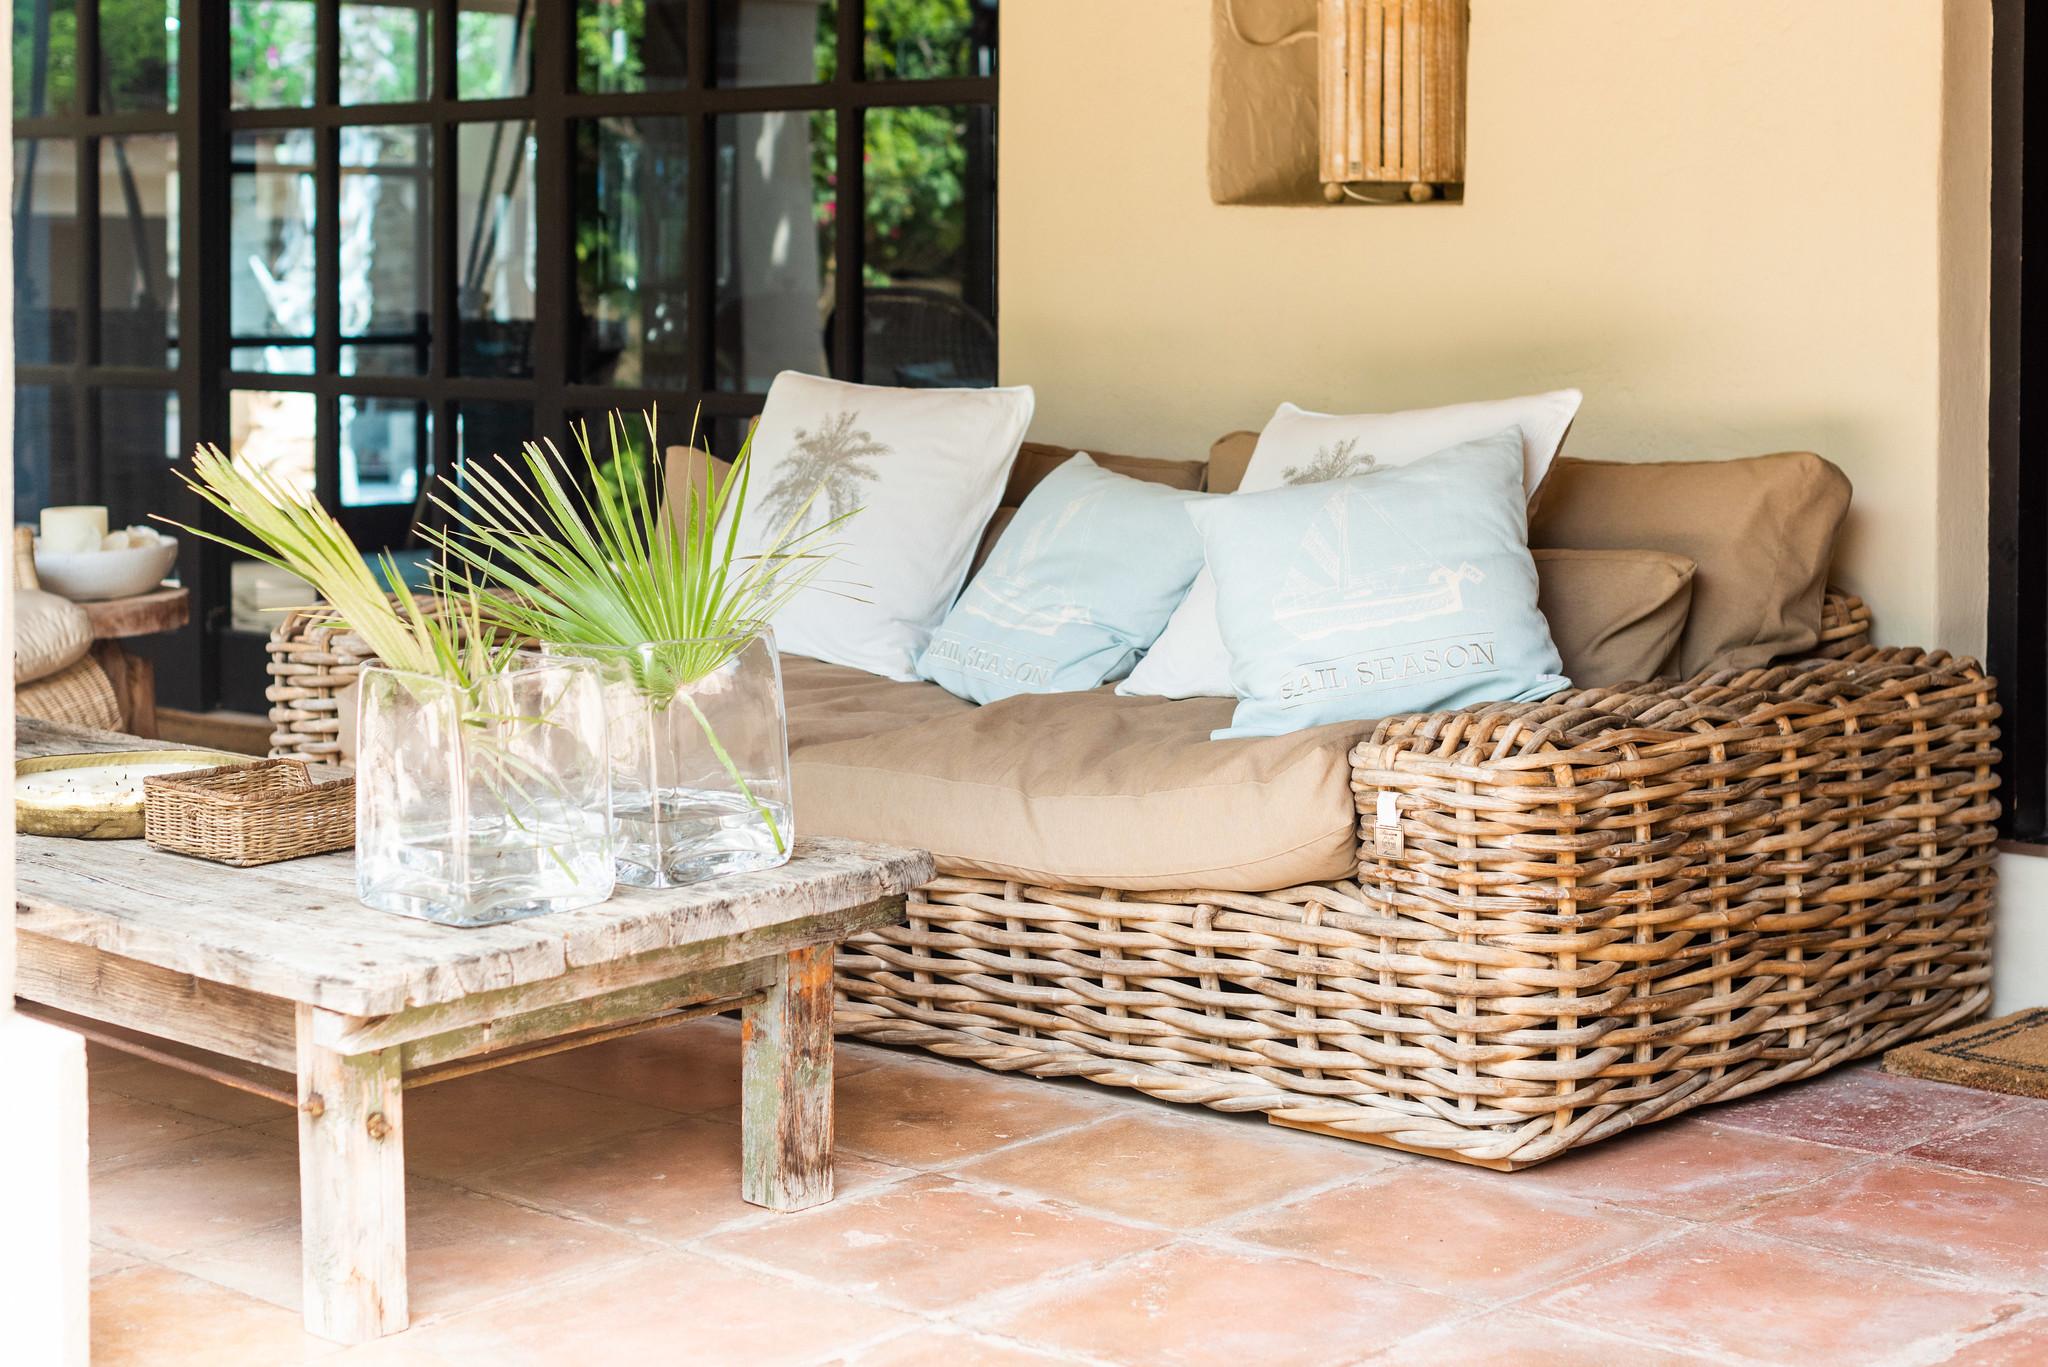 https://www.white-ibiza.com/wp-content/uploads/2020/05/white-ibiza-villas-can-riviere-exterior-sofa.jpg